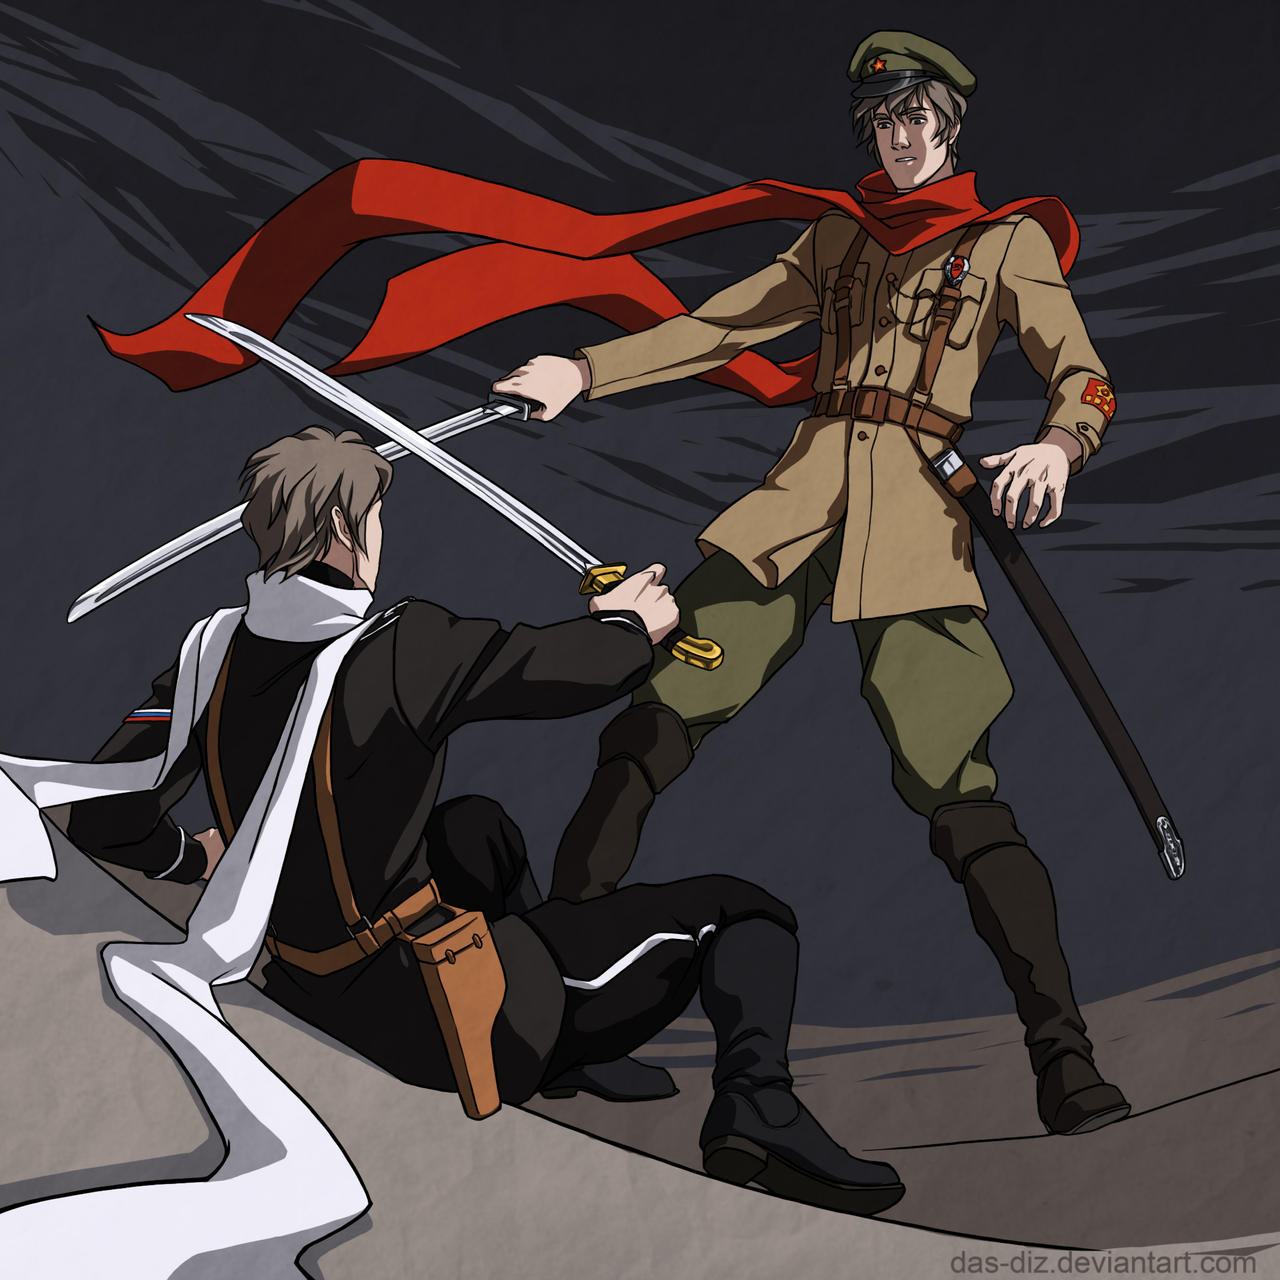 Aph russia 1917 by das diz on deviantart